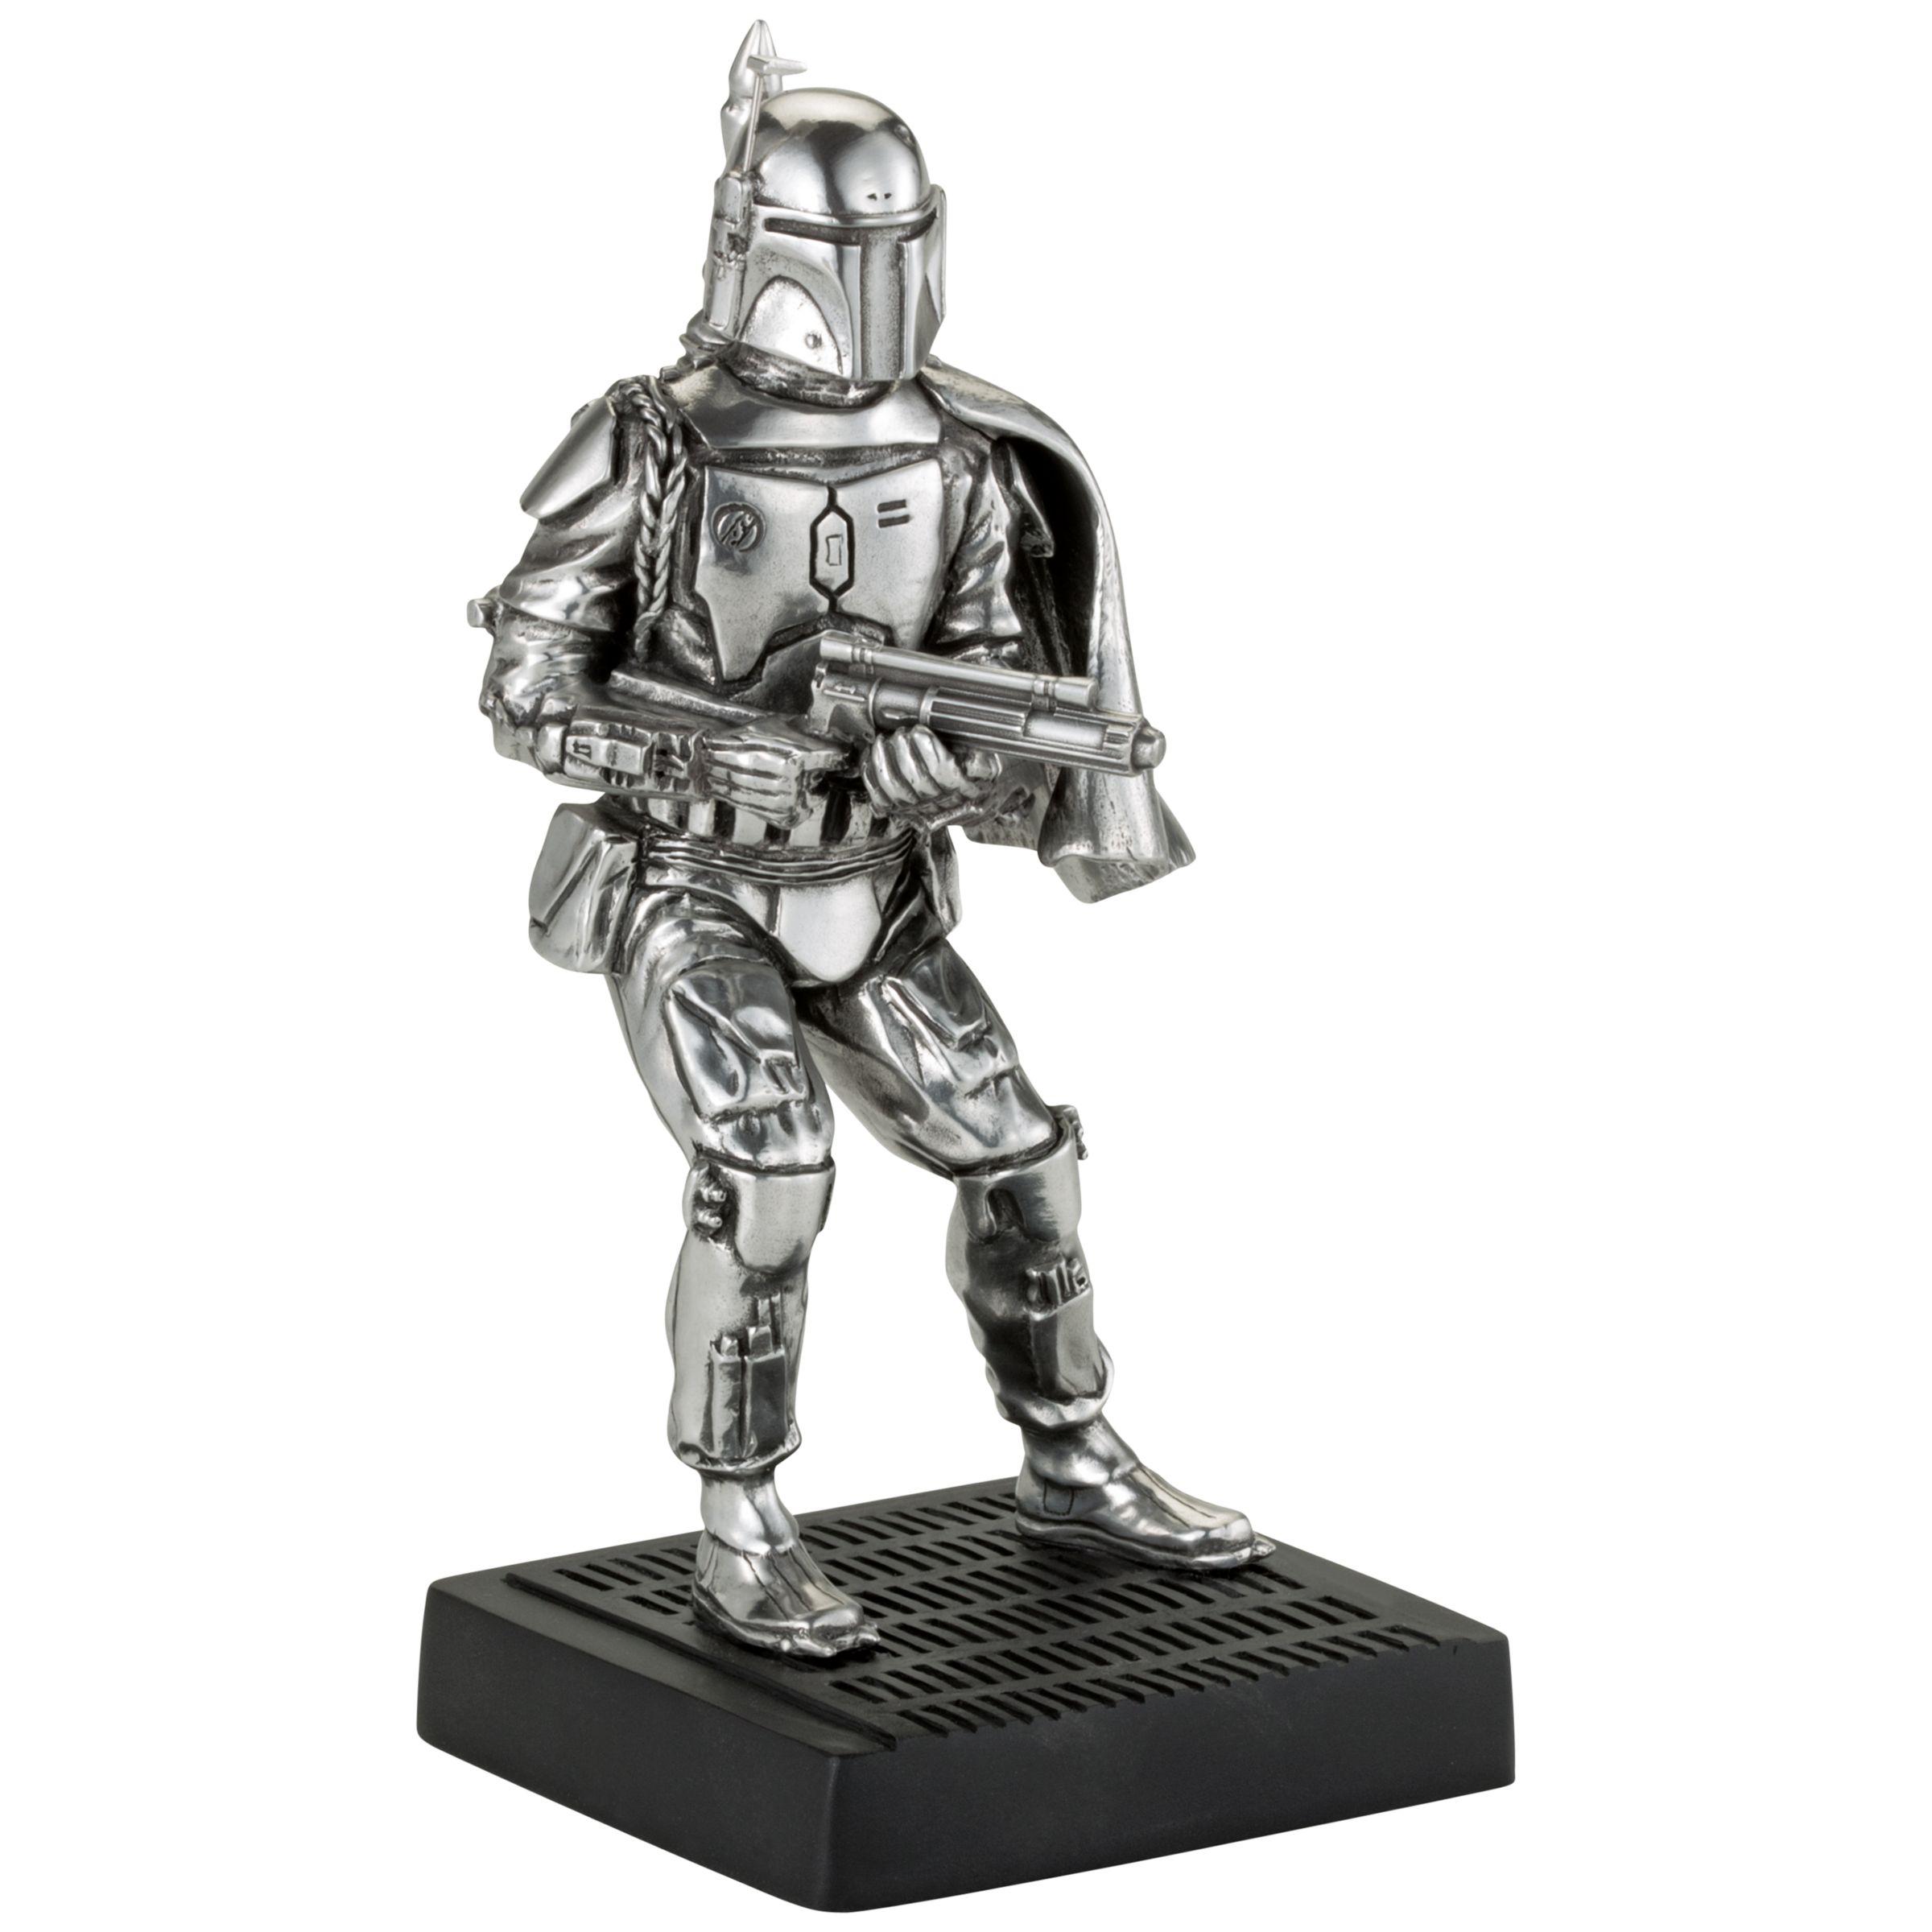 Royal Selangor Royal Selangor Star Wars Boba Fett Figurine